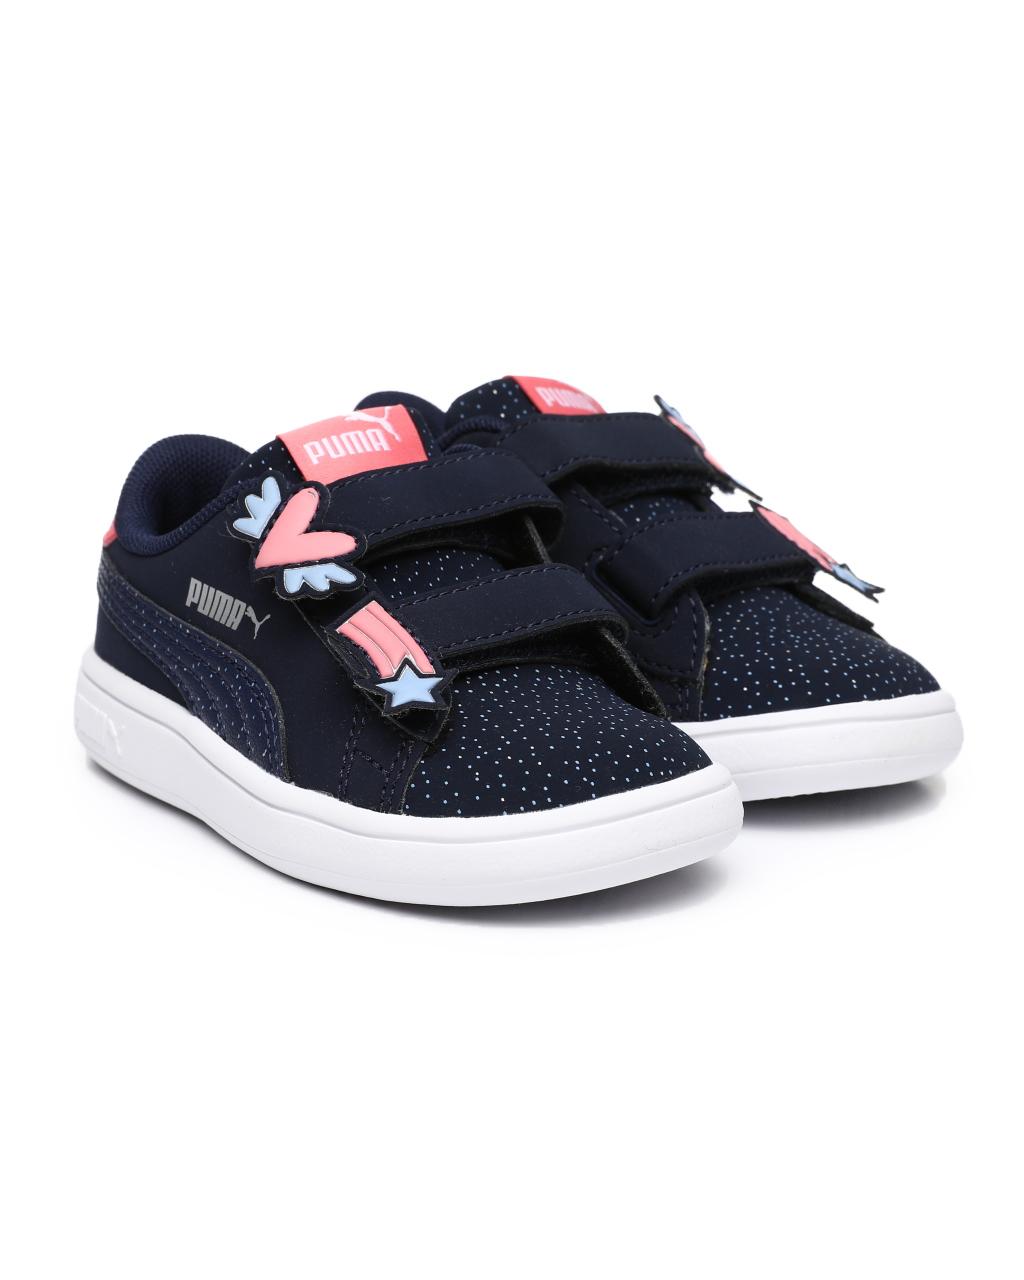 Buy Smash V2 Unicorn Sneakers (5-10) Girls Footwear from Puma ...